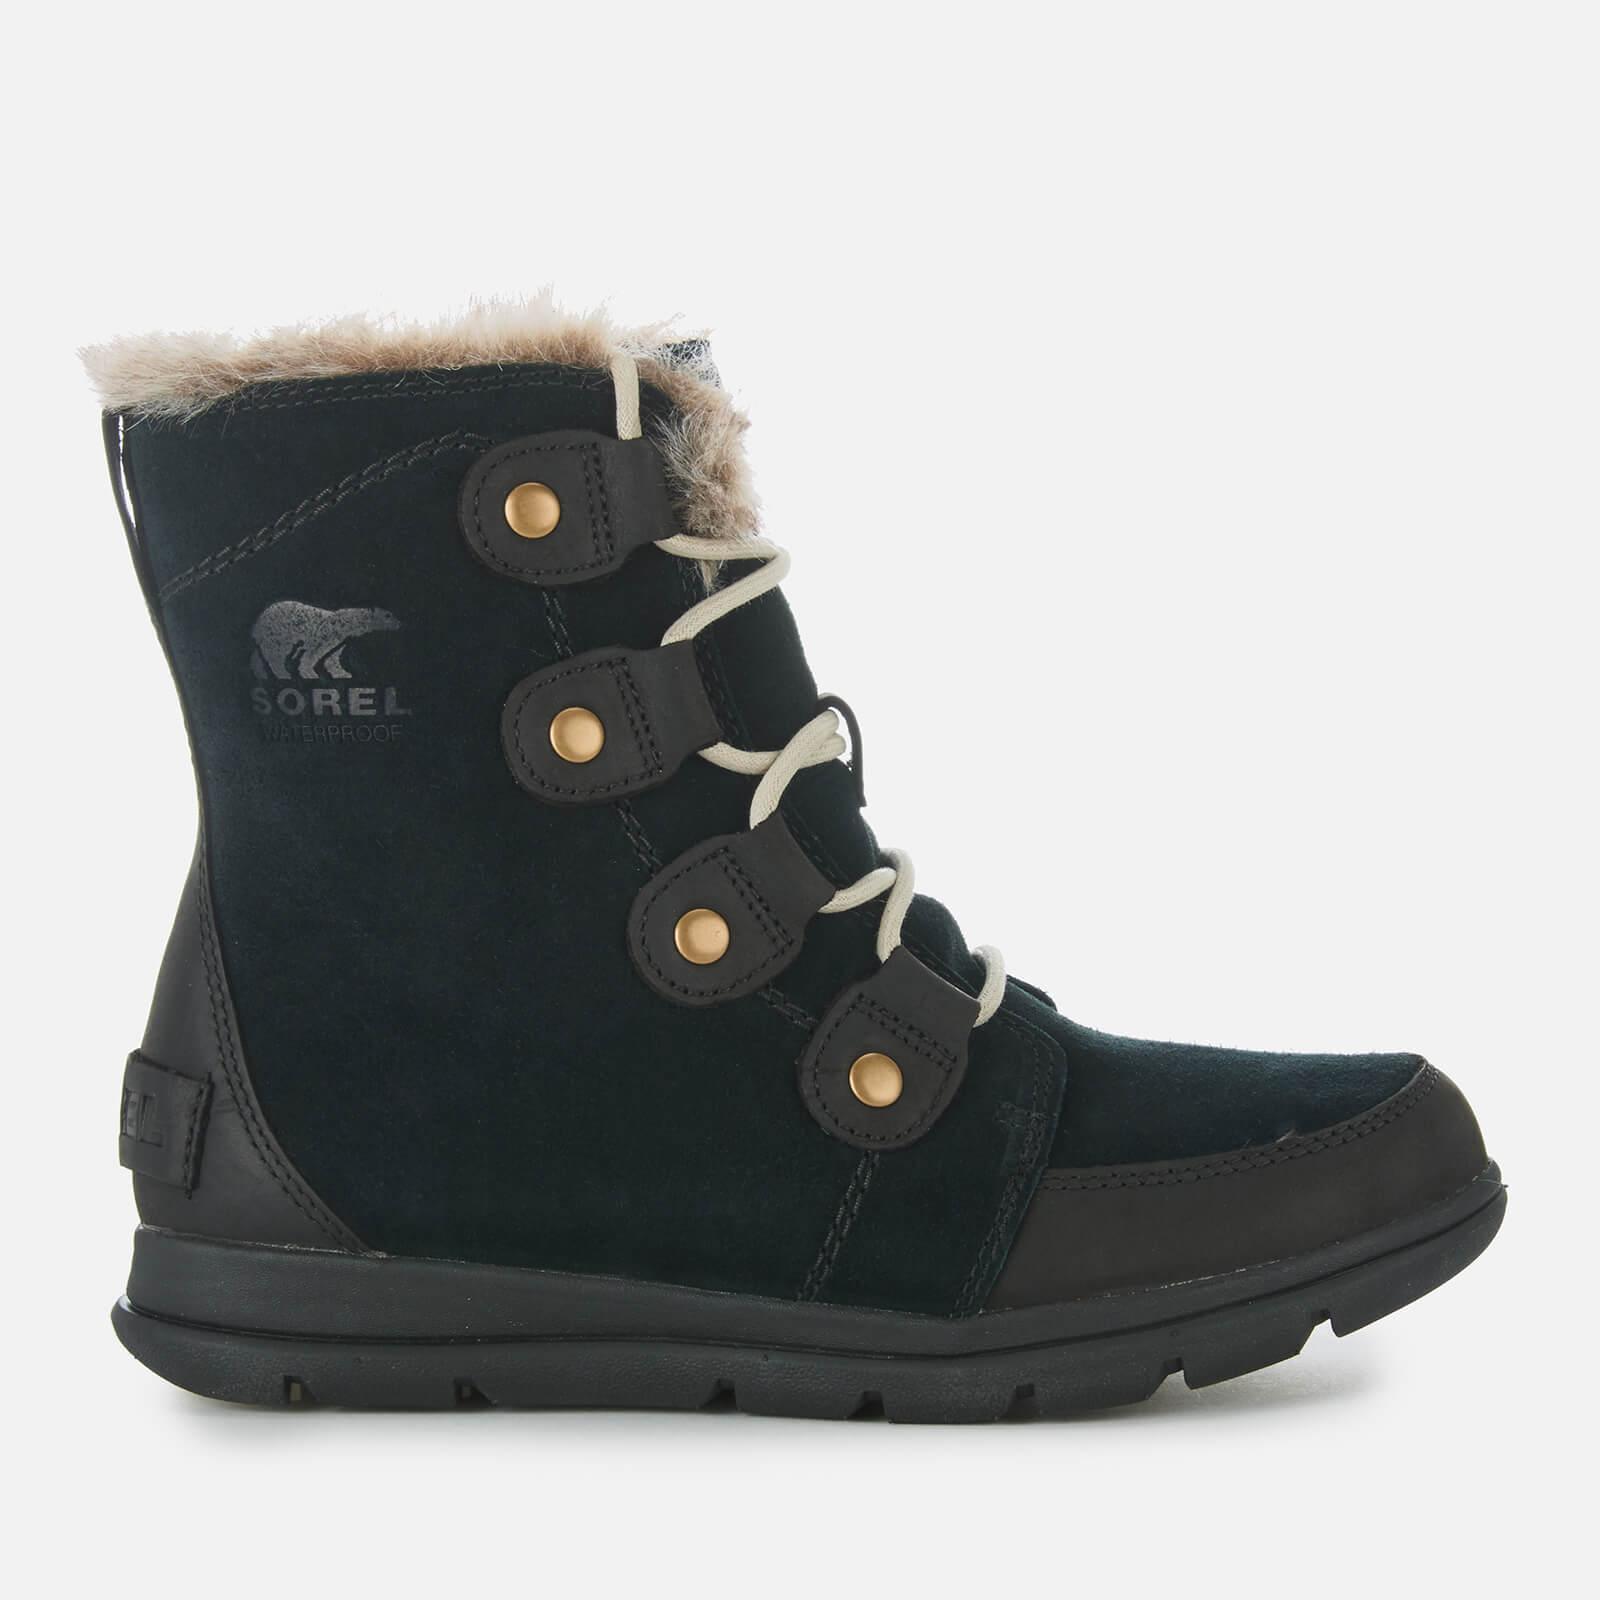 Sorel Women's Explorer Joan Hiker Style Boots - Black Dark Stone - UK 5